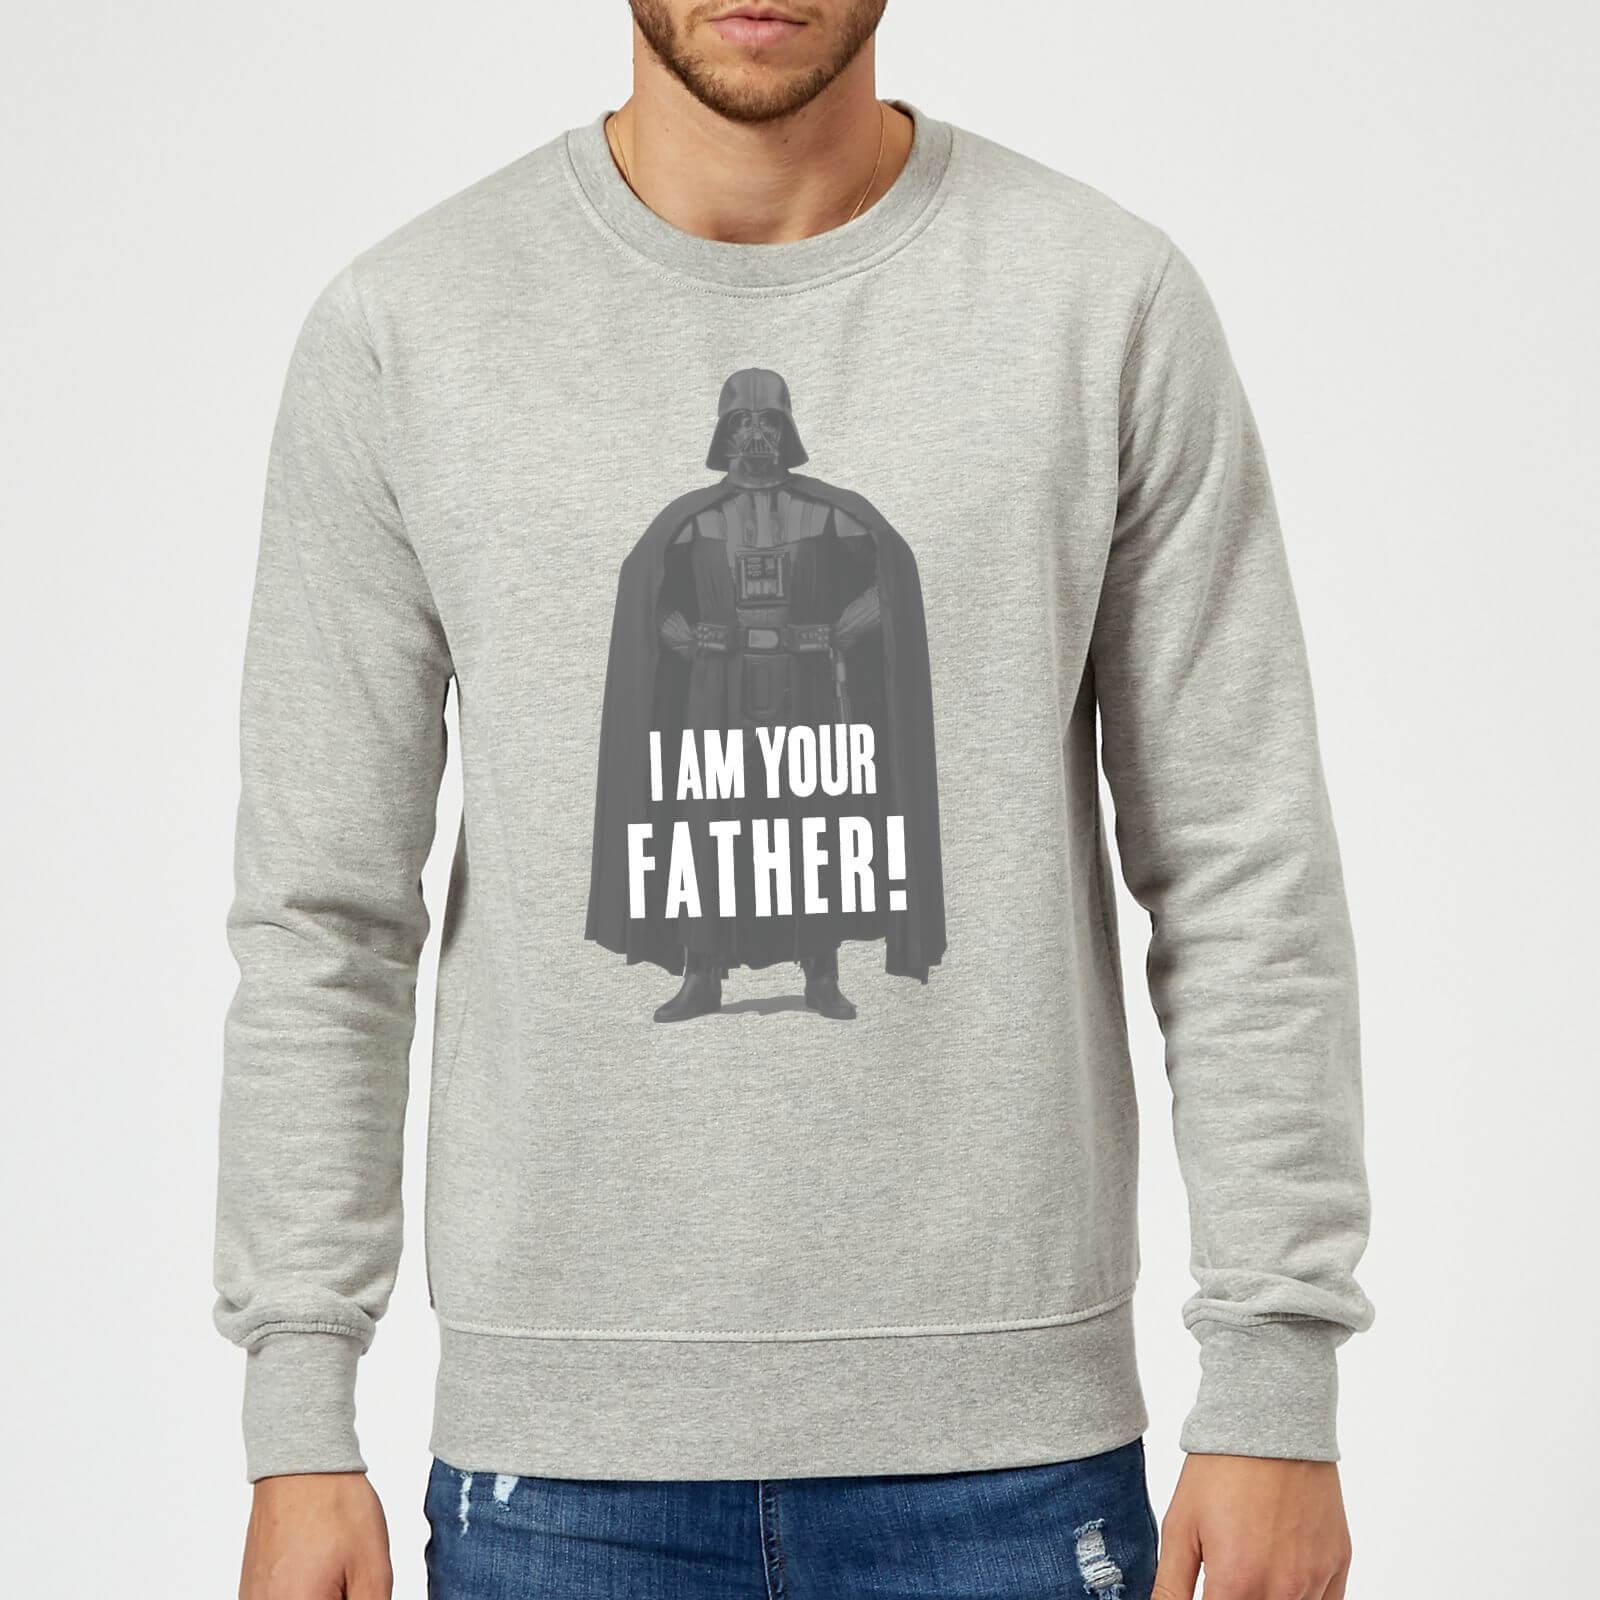 OfferteWeb.click 95-felpa-star-wars-darth-vader-i-am-your-father-pose-grigio